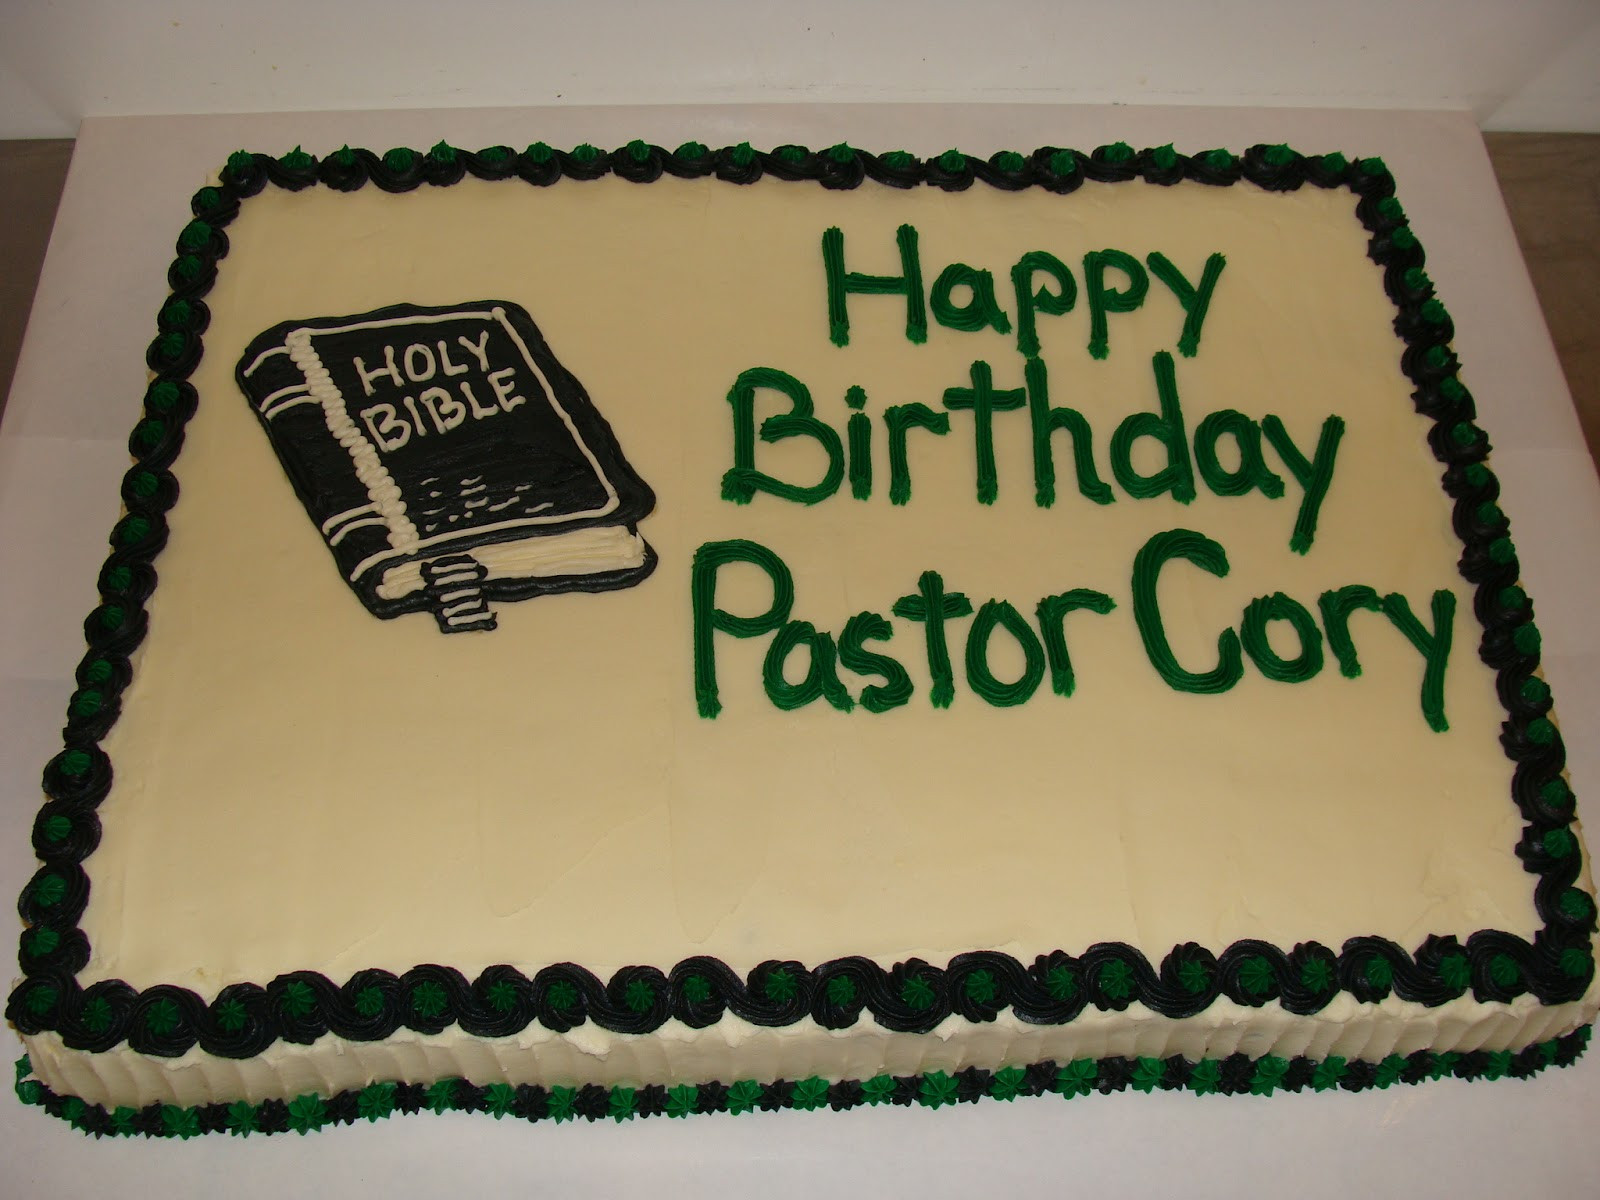 February Birthday Cakes Door County Custom Cakes And Cookies Pastor Corys Birthday Cake